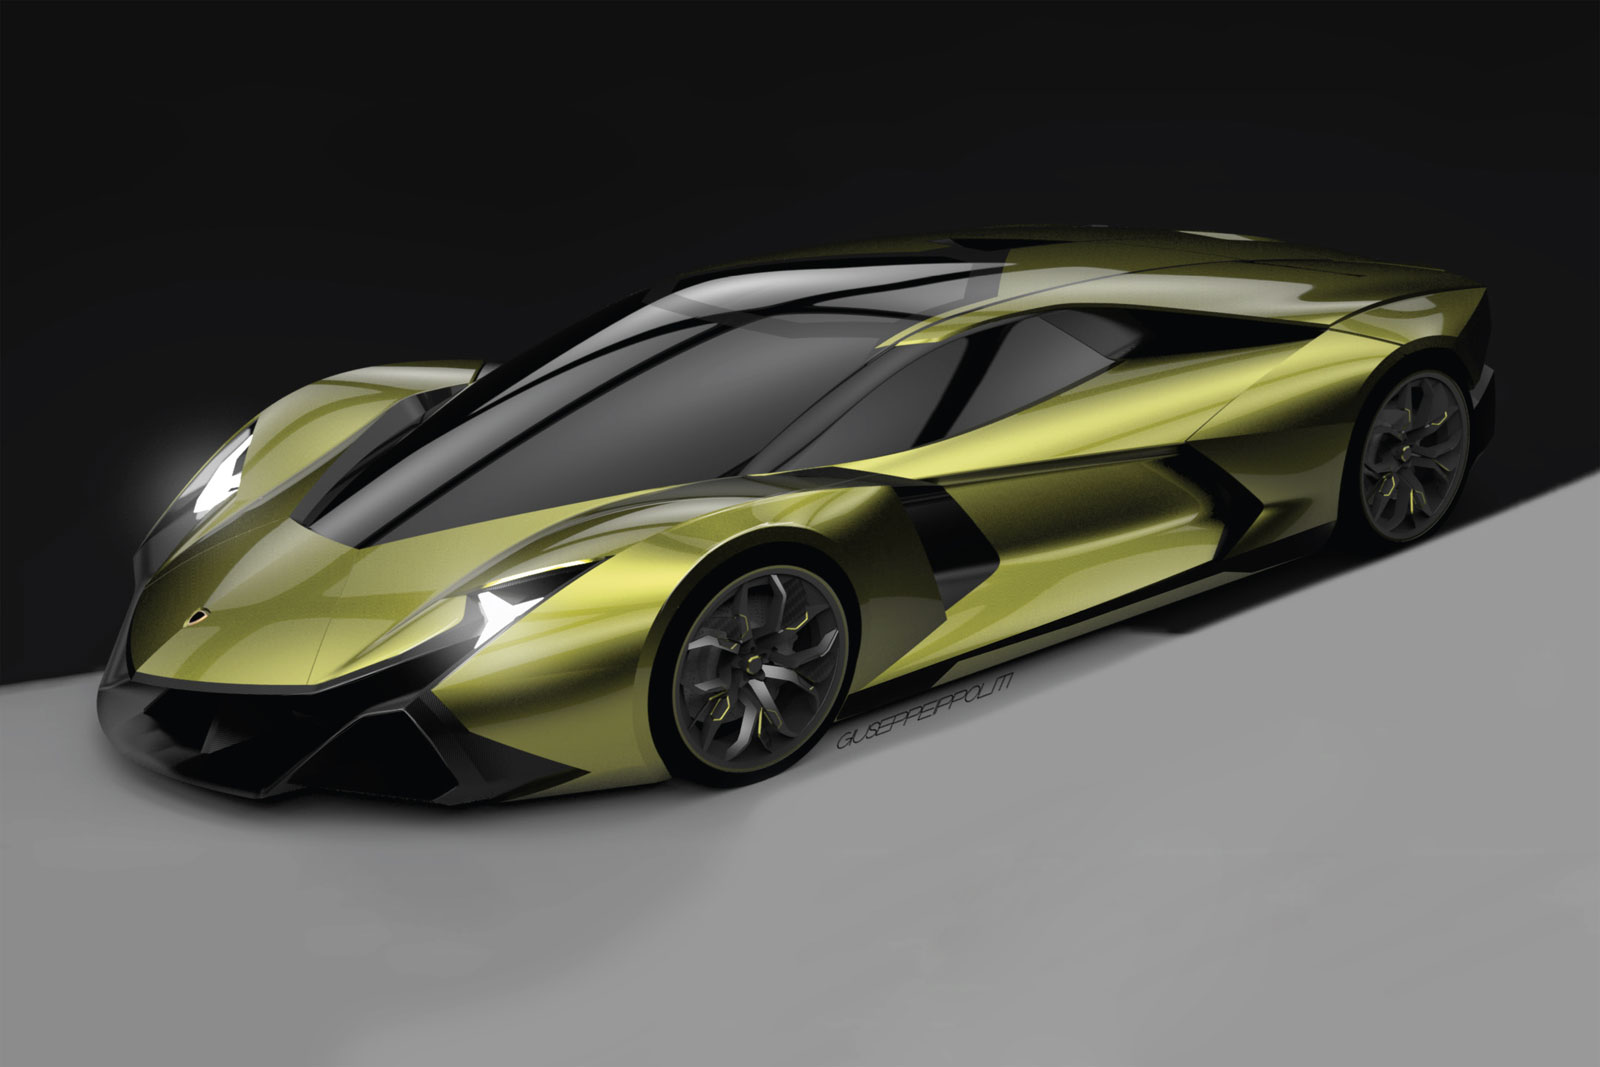 Lamborghini Encierro Concept By Spd Car Body Design